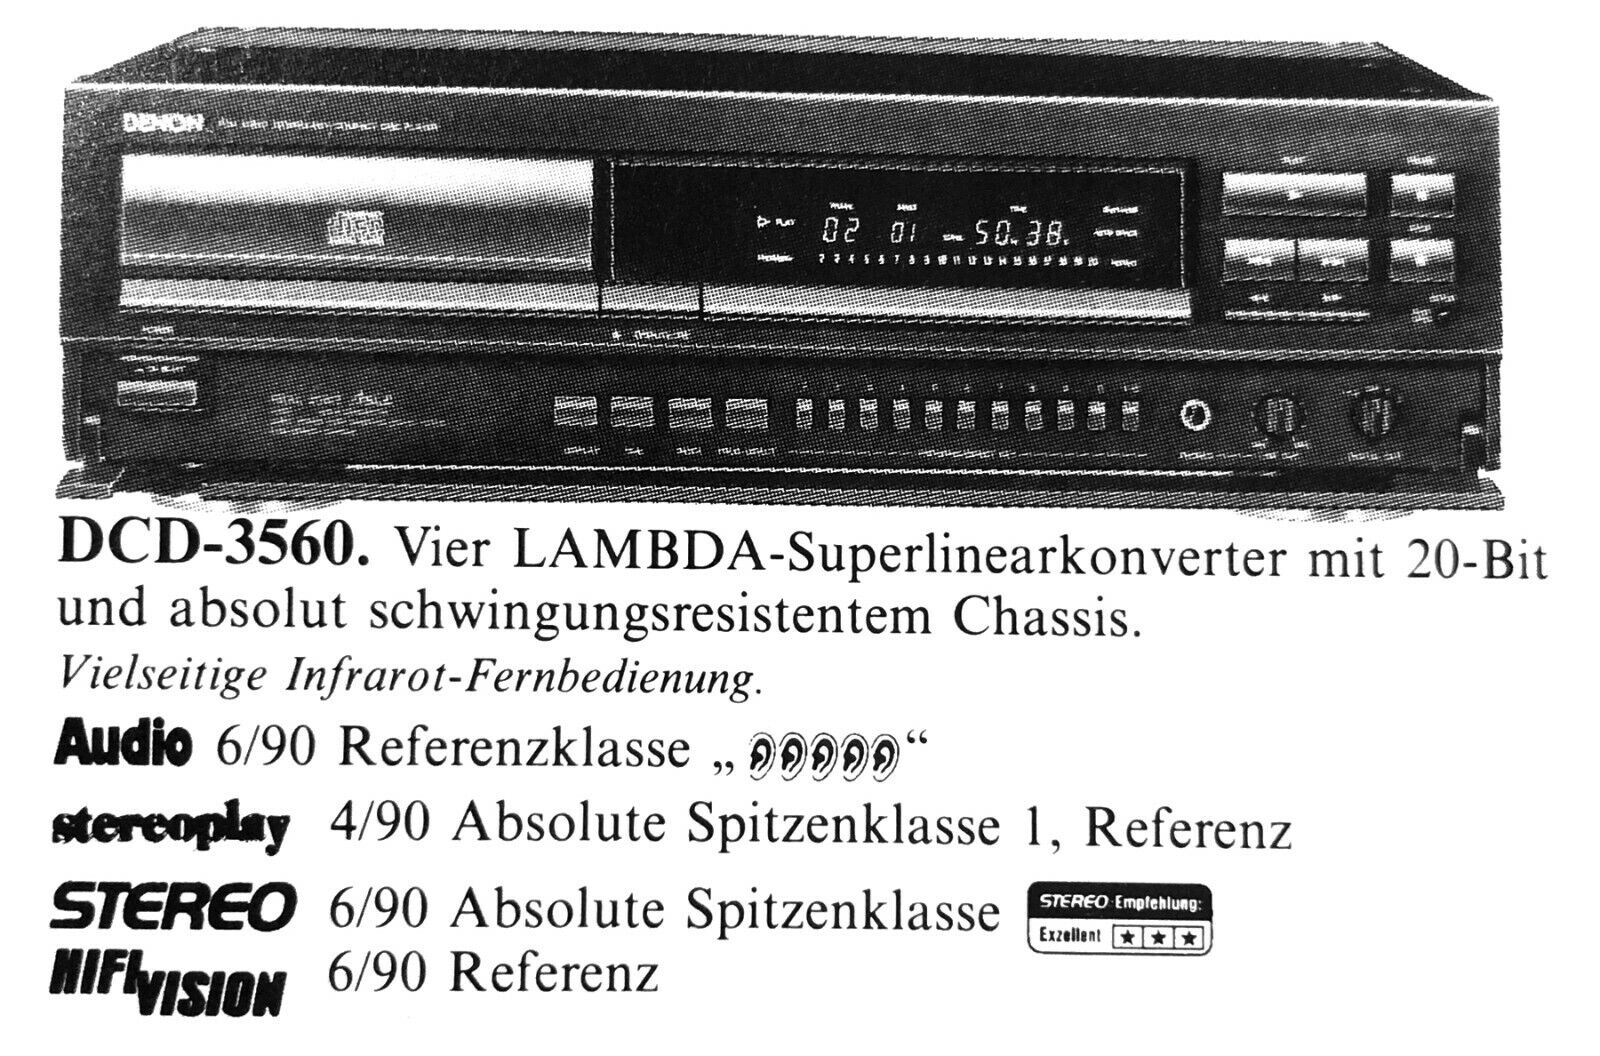 O meu outro sistema... S-l1600